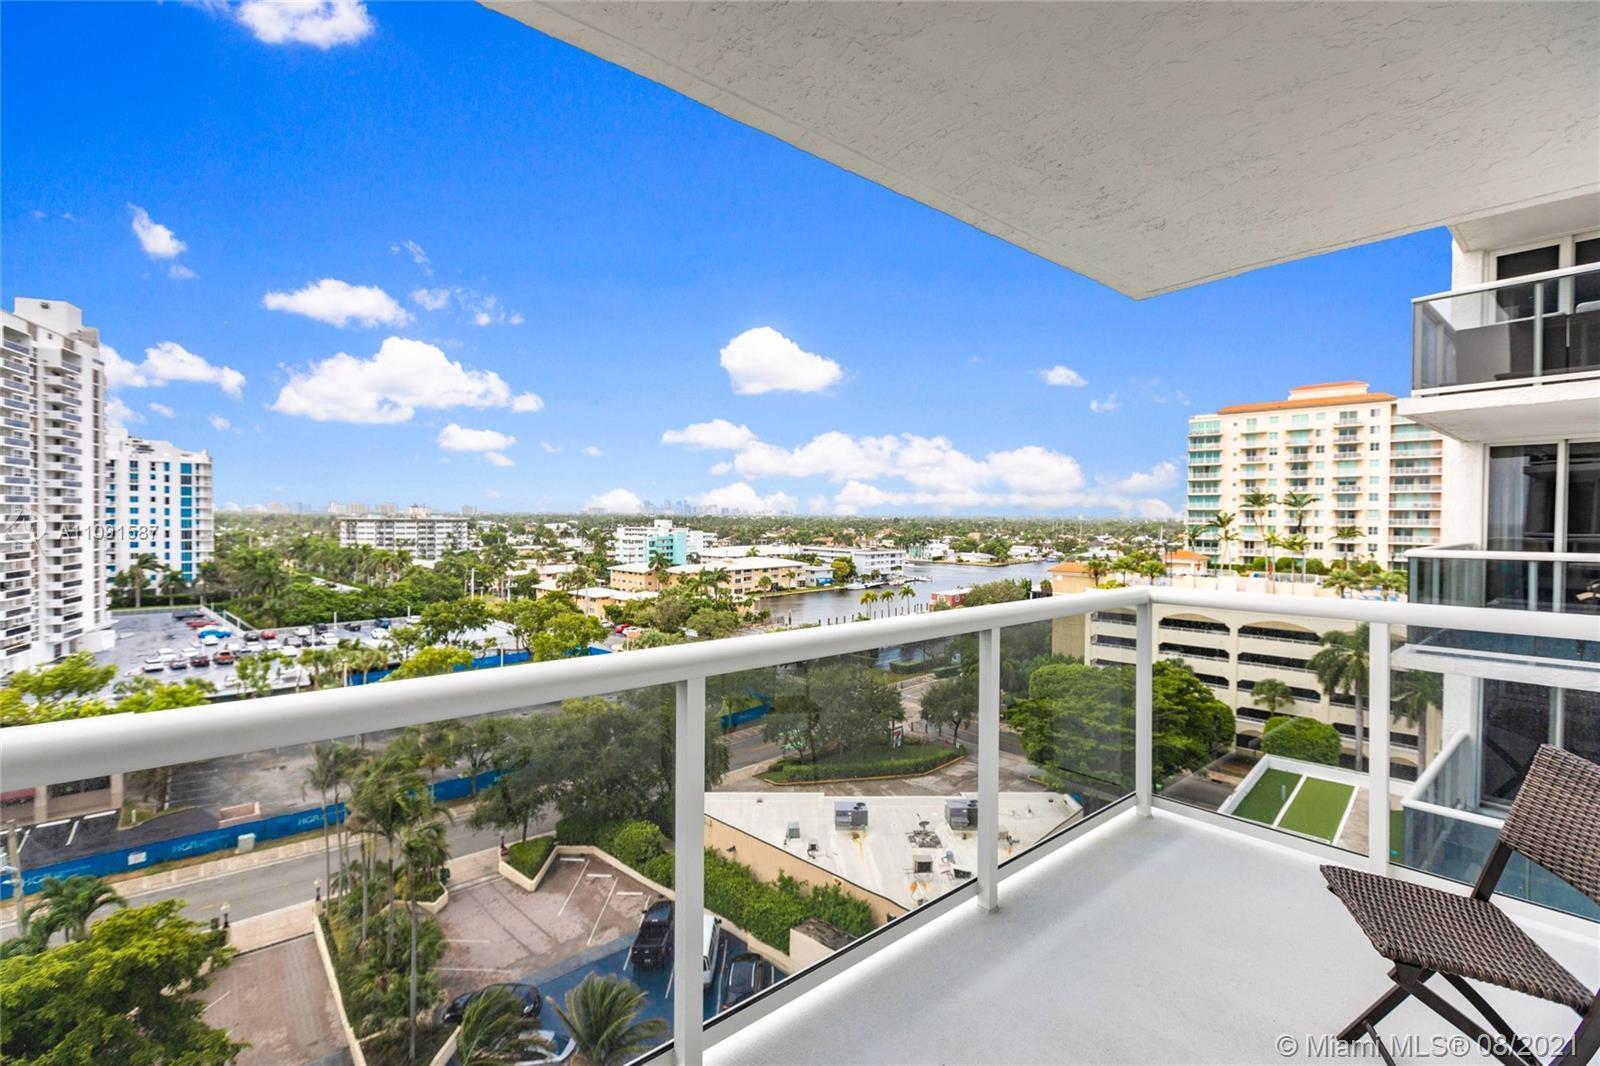 Beautifully Updated 2 Bedroom, 2 bathroom. 1144 SQFT unit with panoramic Ocean Views, downtown Las O